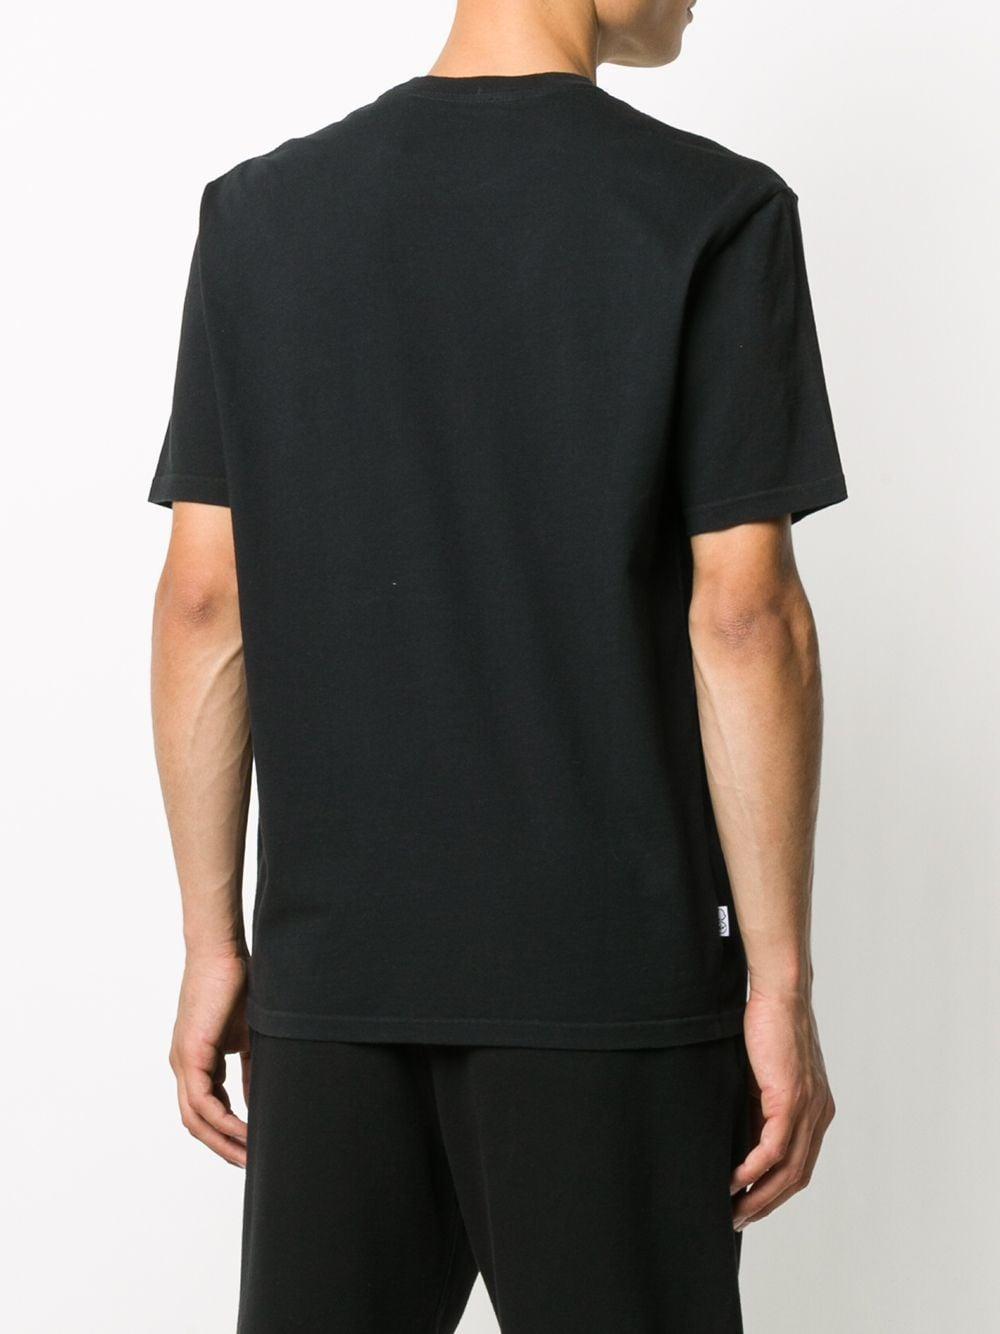 black cotton Moncler Genius x Fragment Design white graffiti print t.shirt MONCLER GENIUS |  | 8C707-10-8392B999